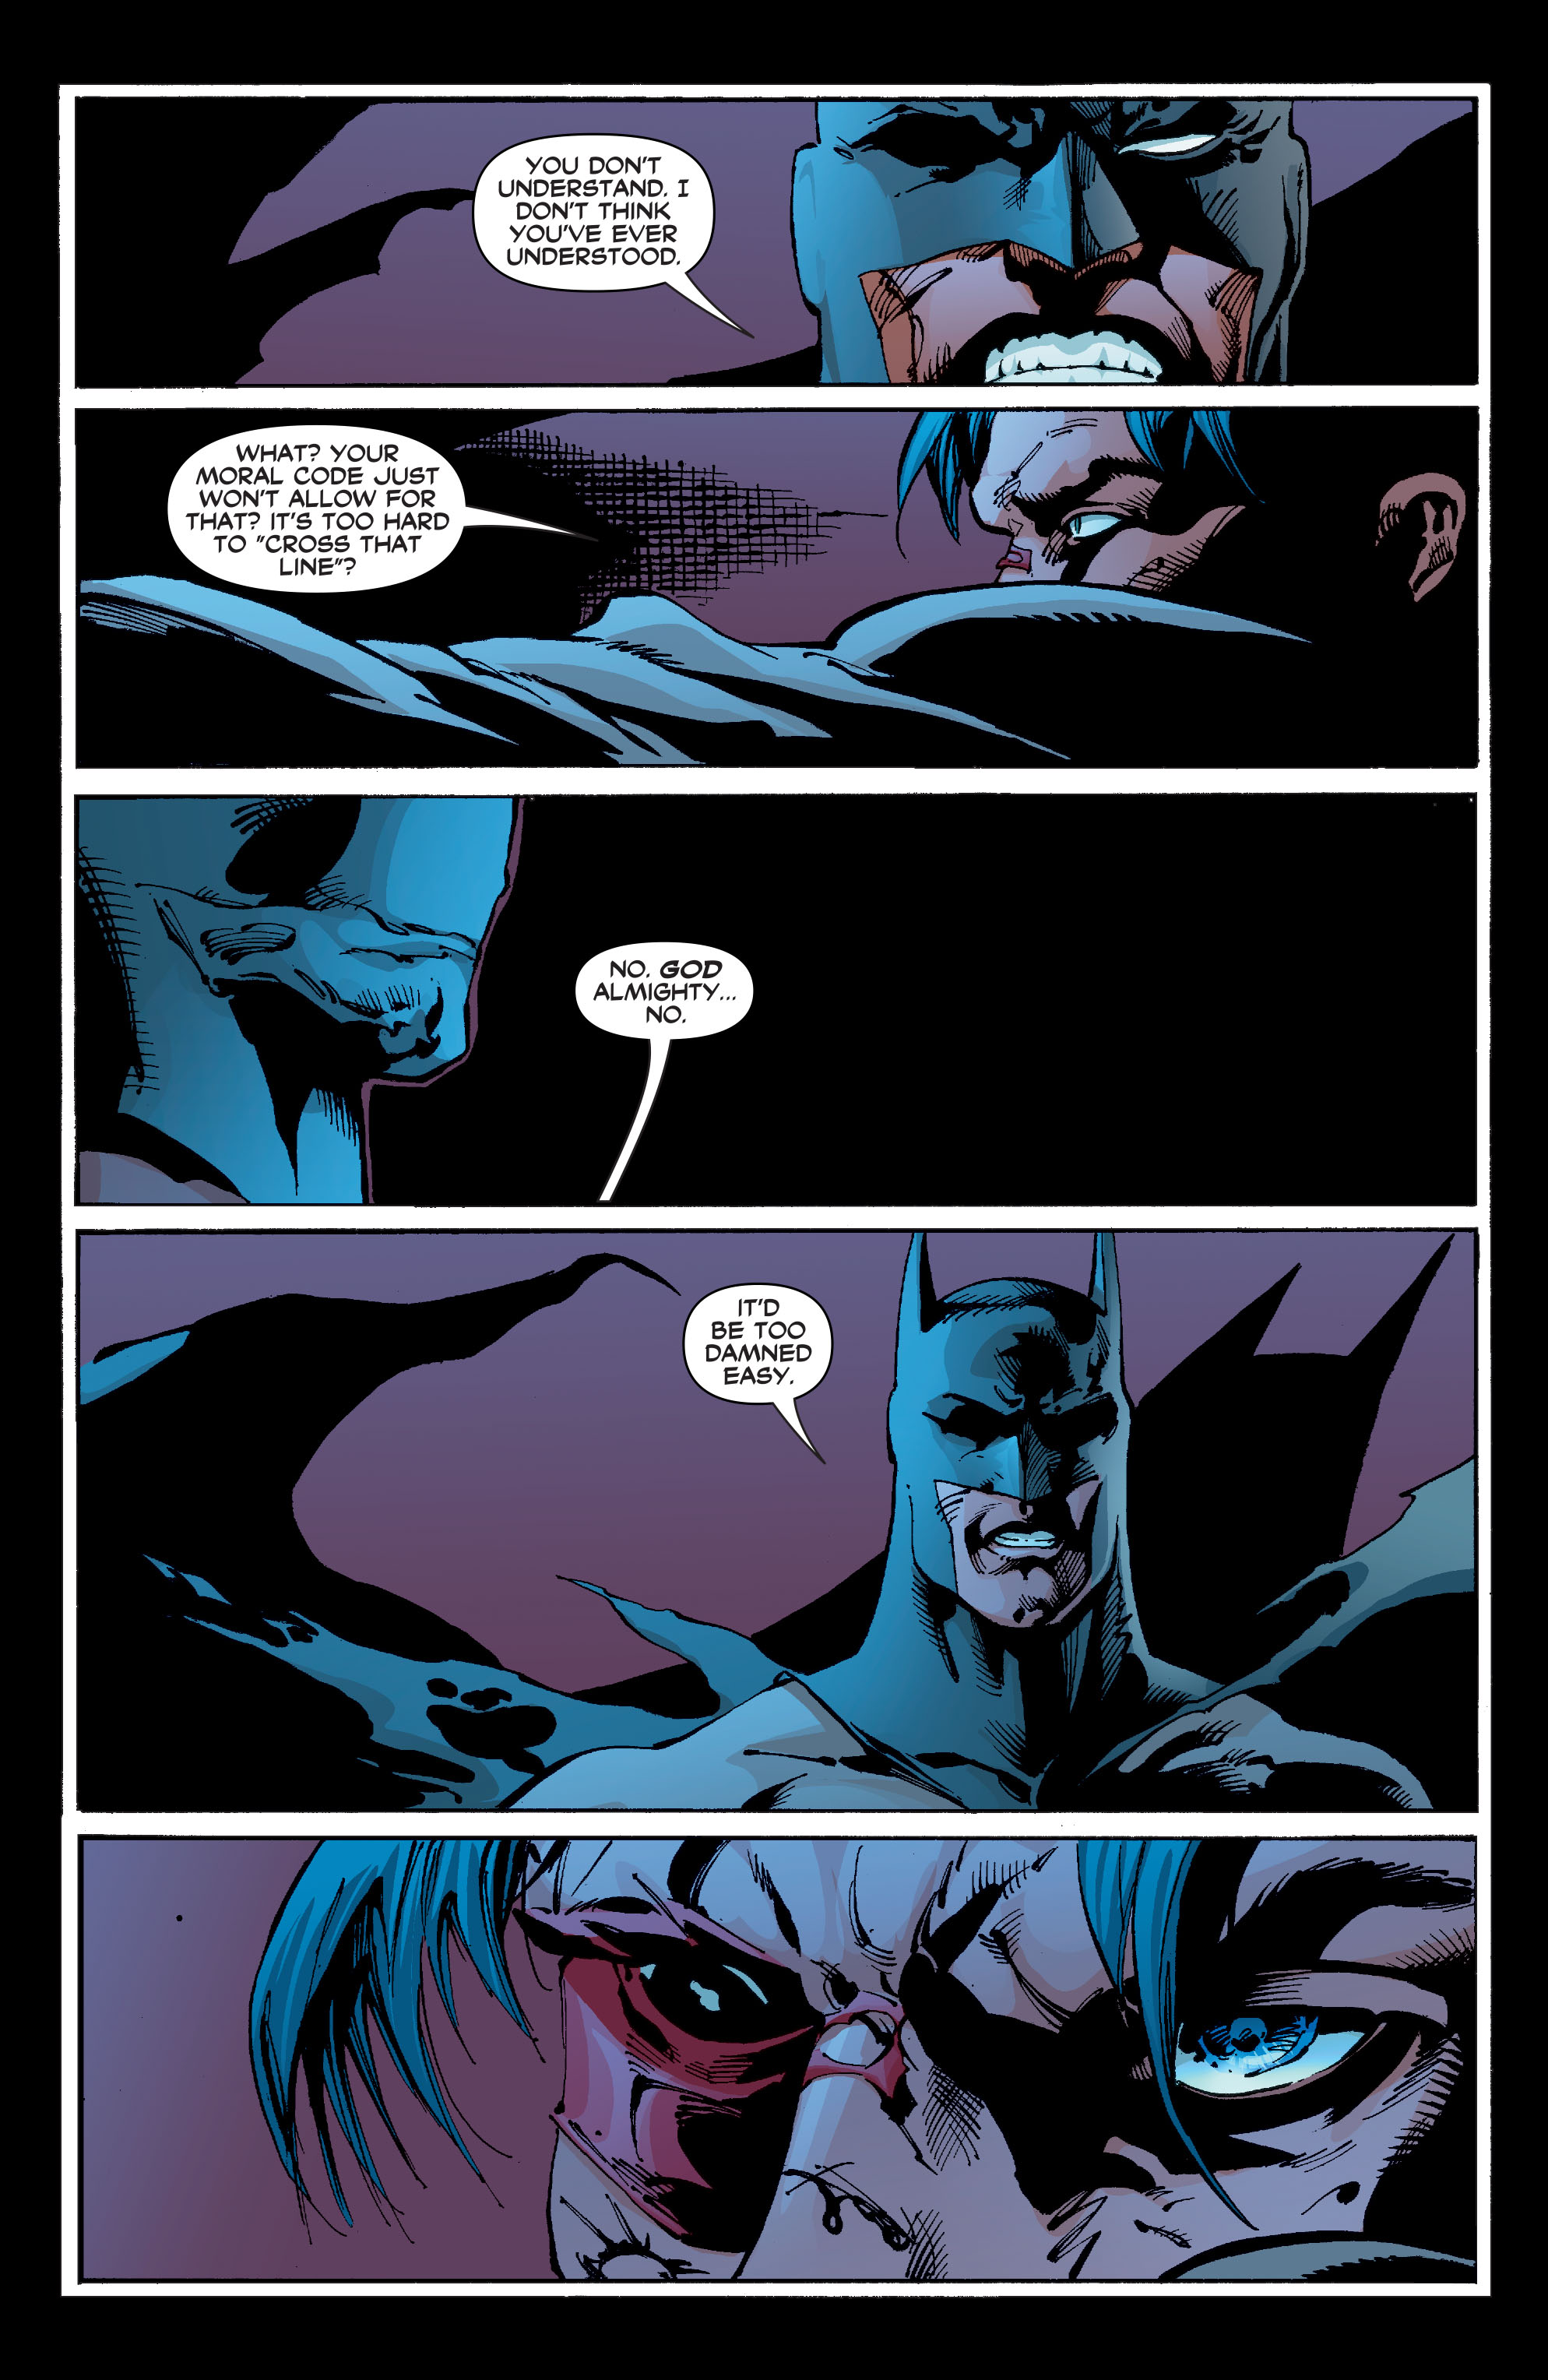 Psychology of Bruce Wayne EVb-awPjmcrjGgb18iElPfoCKd3Tr89P8U3xLVob5B82gYiBlfGgtxx251QCihigzunOzJfCdsQd=s0